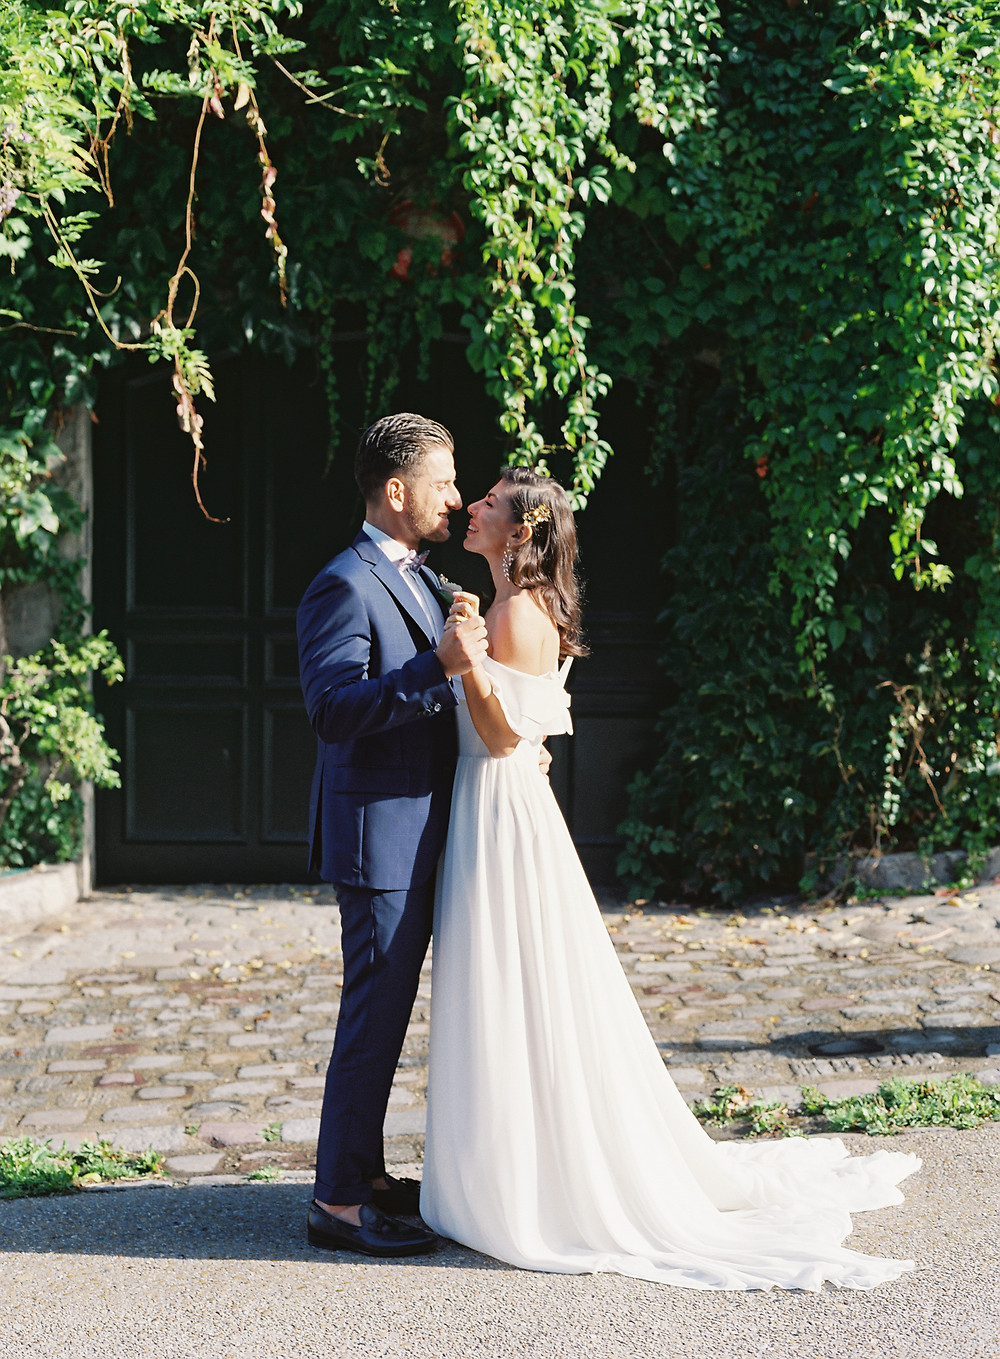 Destination Wedding Planner, Paris, France